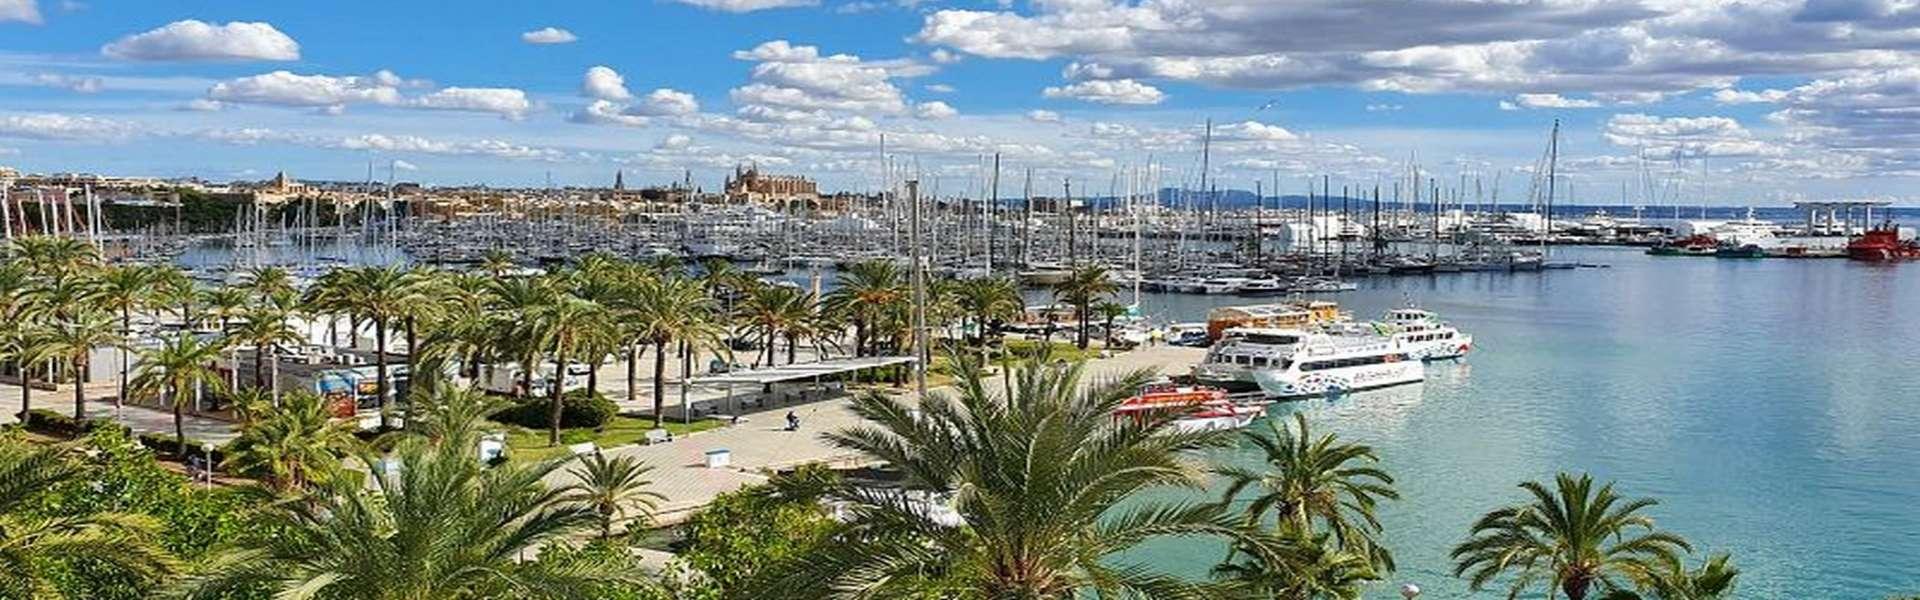 Palma/Paseo Marítimo - Apartamento con hermosas vistas en venta